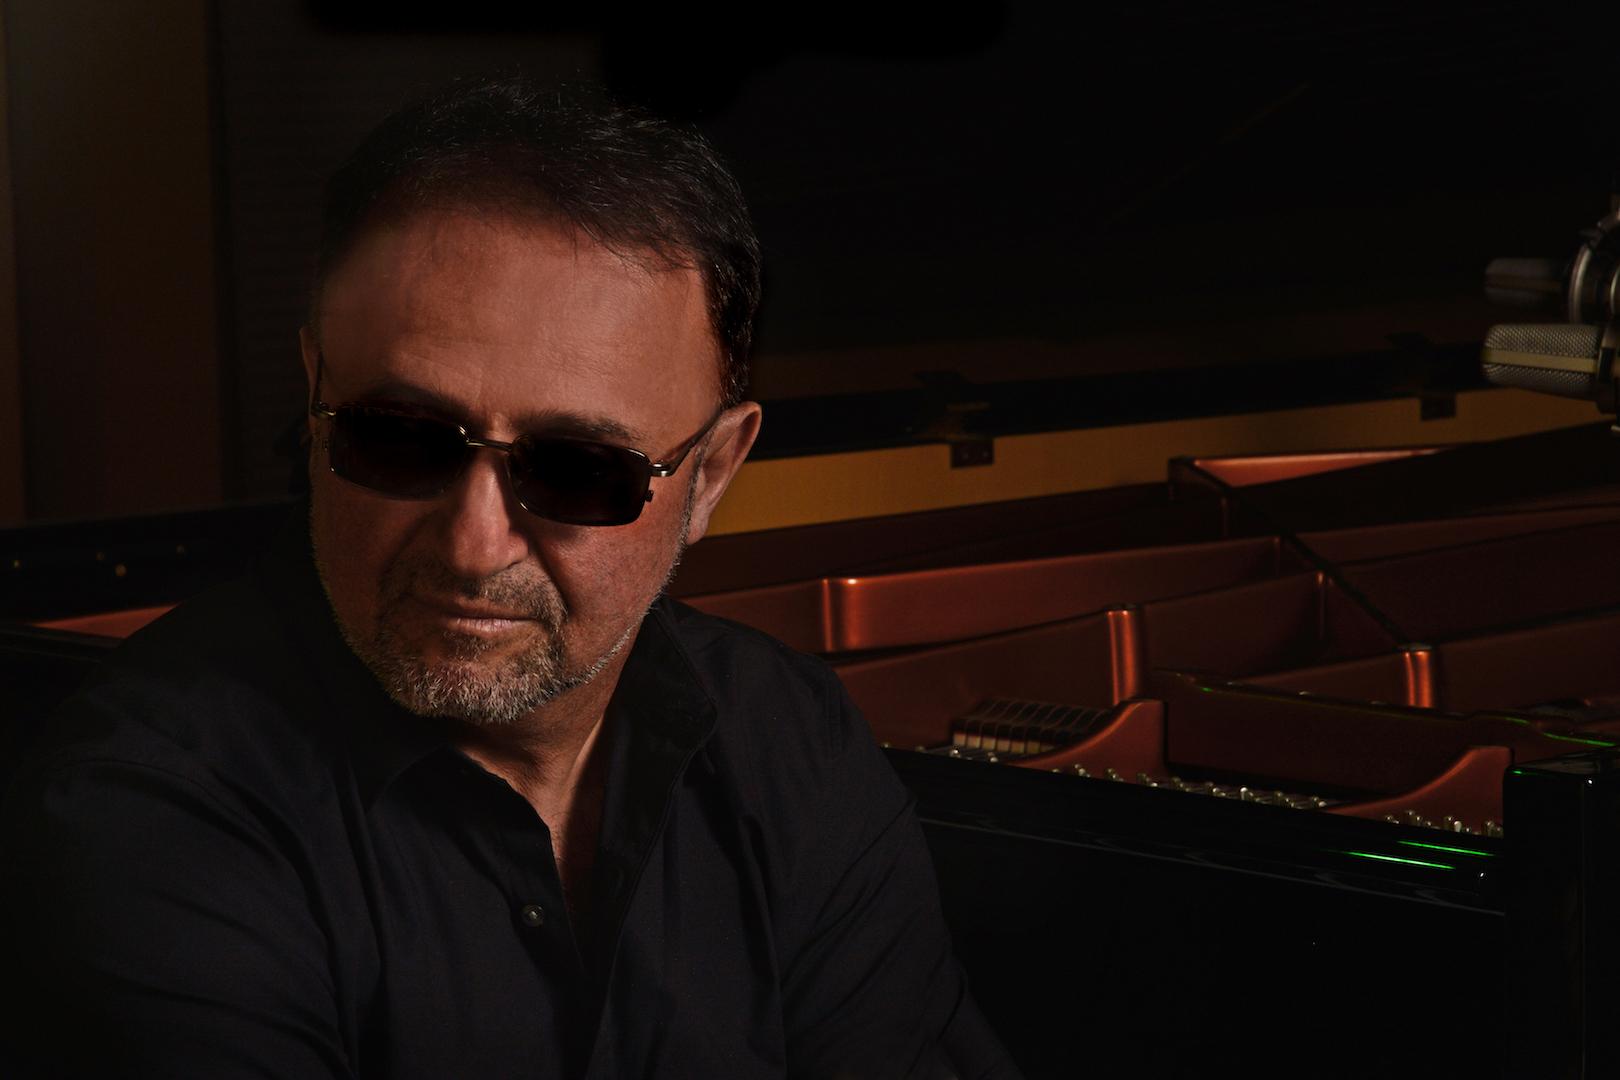 Mikan Zlatkovich